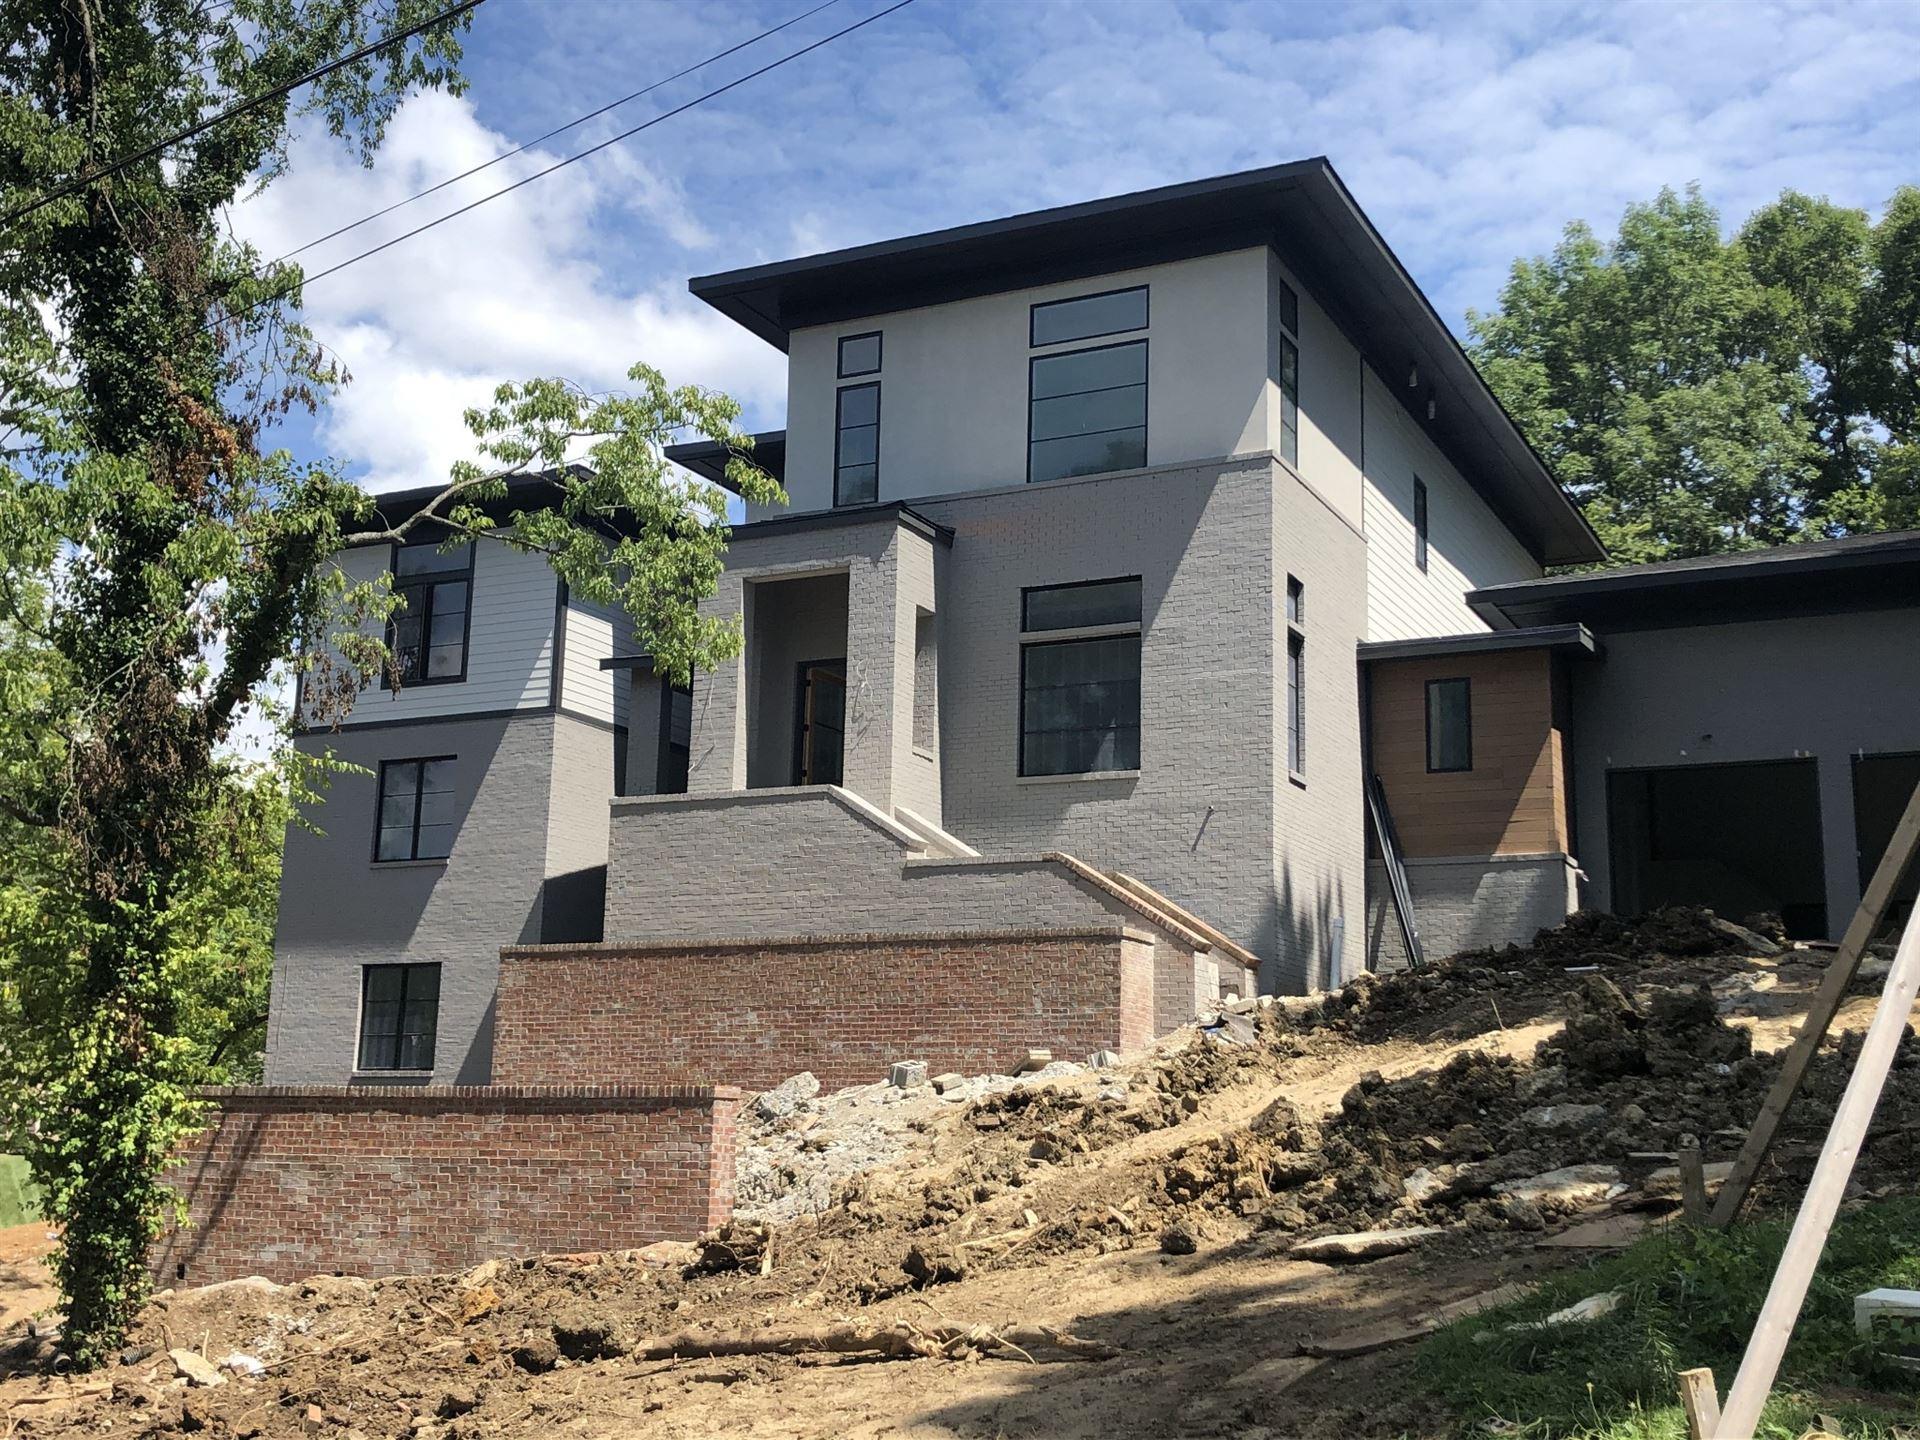 Photo of 3536 Trimble Rd, Nashville, TN 37215 (MLS # 2168909)